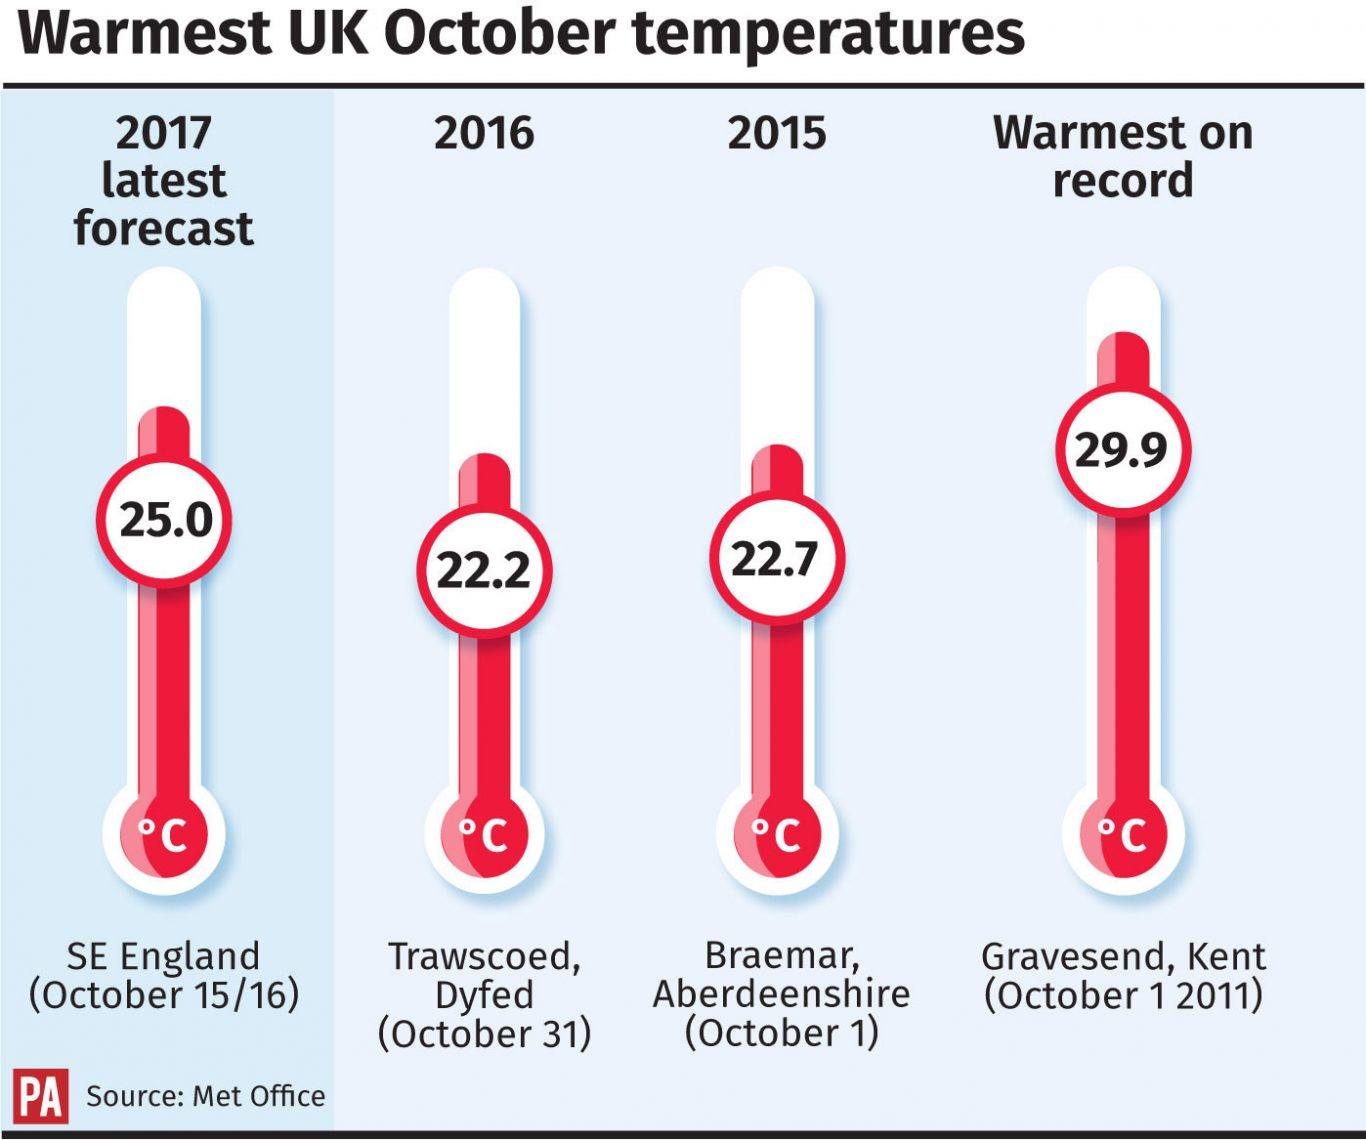 Warmest UK October temperatures